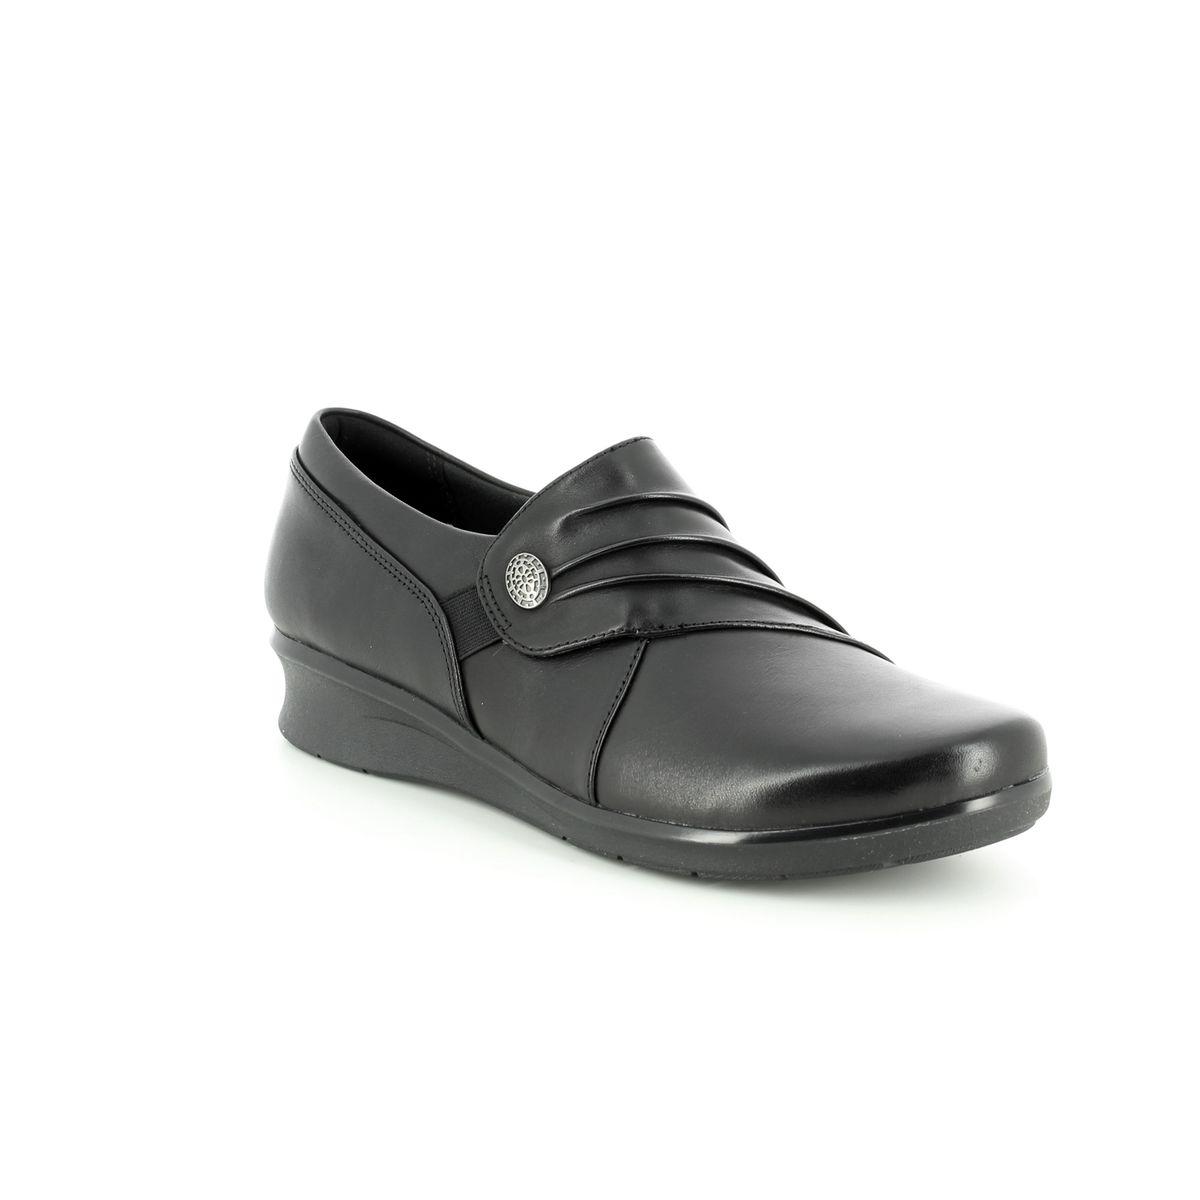 87e5032bc9f9 Clarks Comfort Shoes - Black leather - 3720 04D HOPE ROXANNE